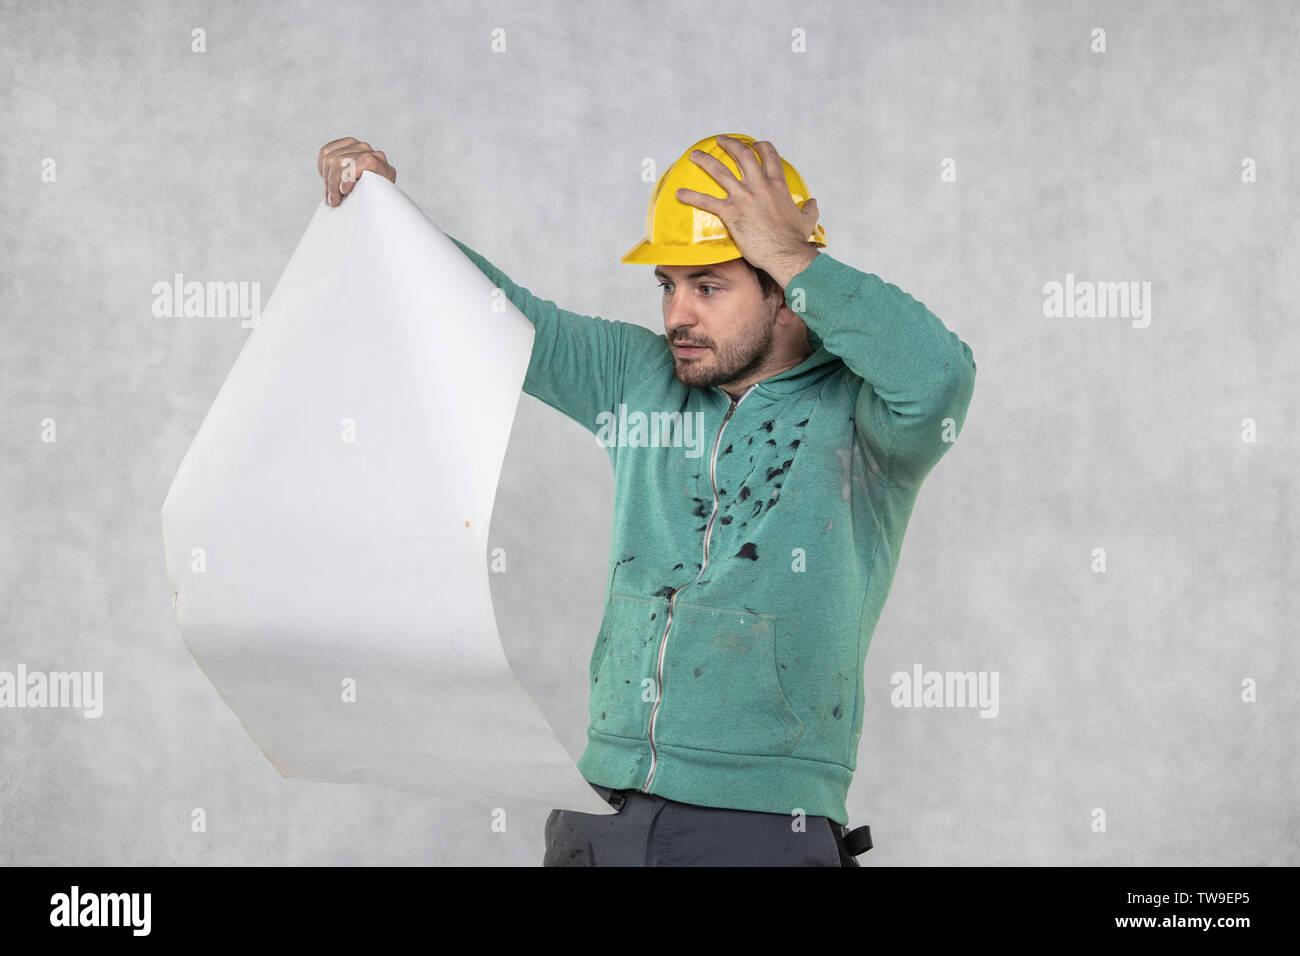 Erschrocken builder sieht Baupläne Stockbild